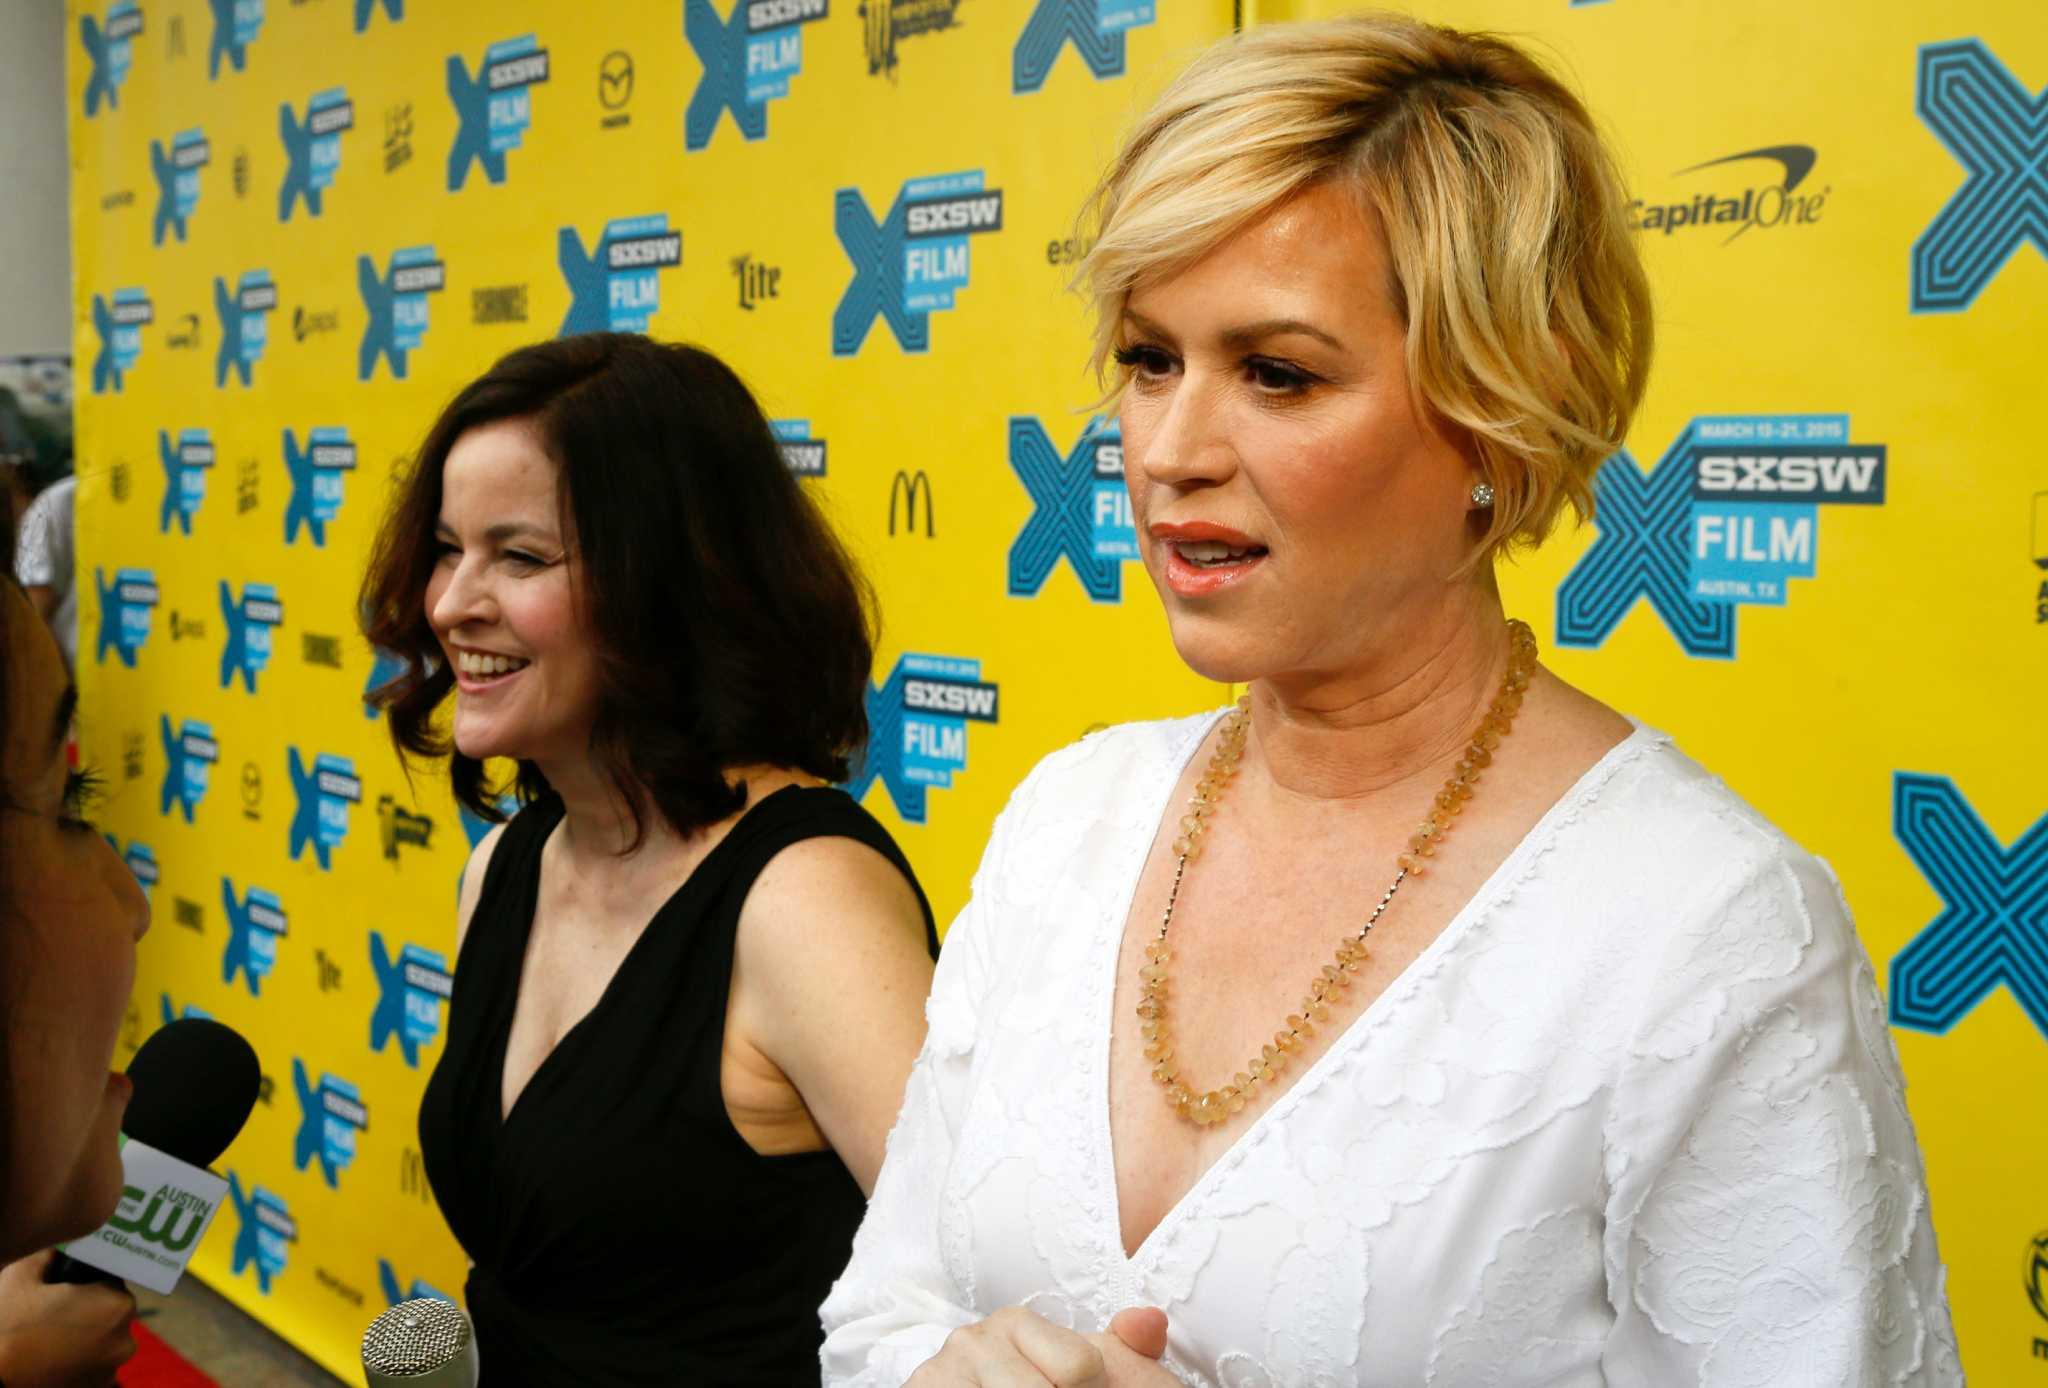 Ally Sheedy Fakes stars' appearance reawakens interest in 'breakfast club